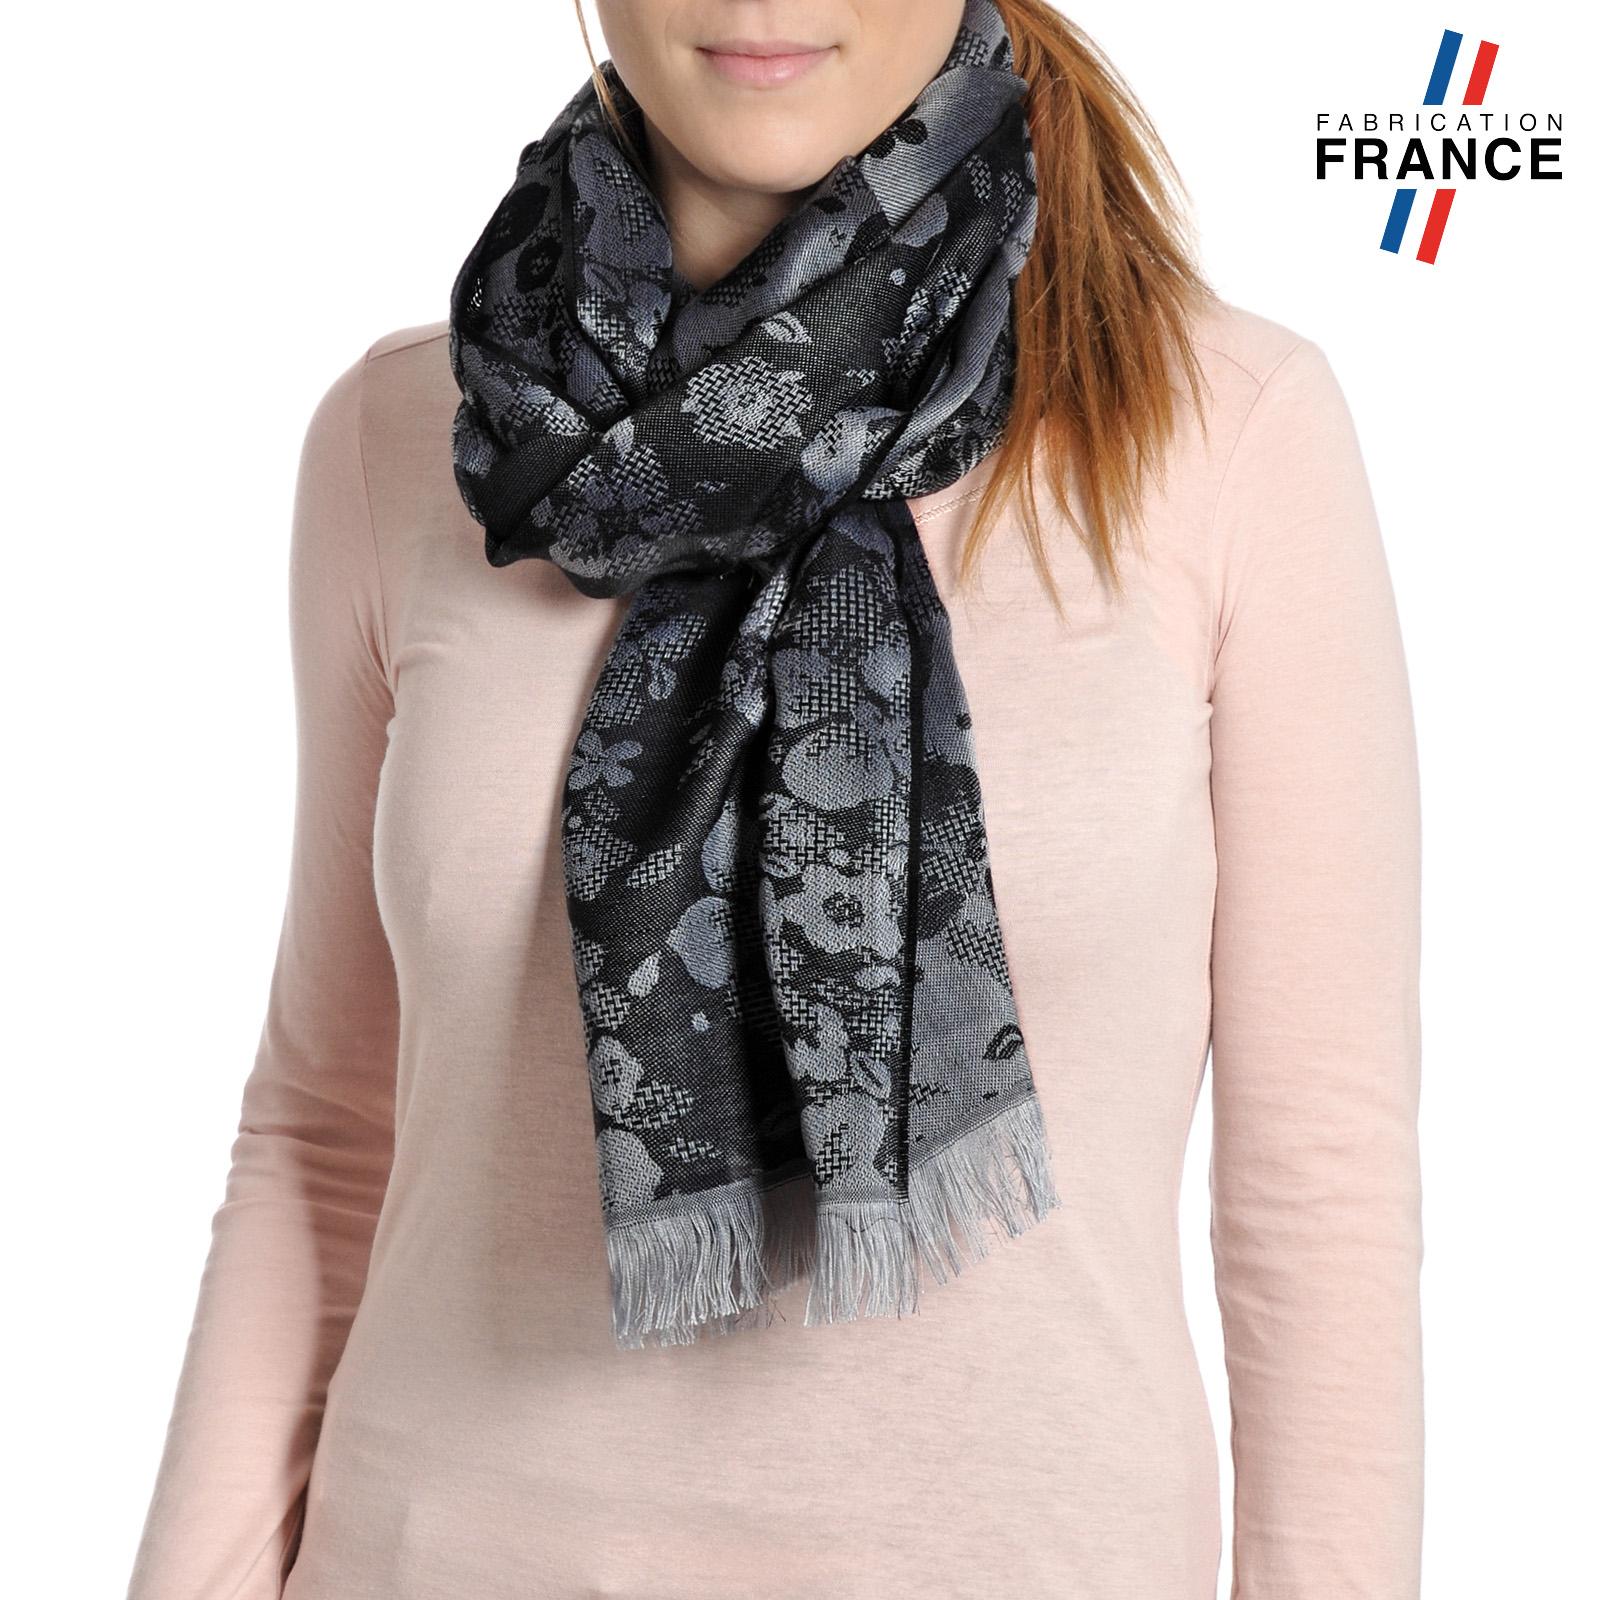 AT-04249-VF16-P-LB_FR-echarpe-femme-noire-trefles-fabrication-france